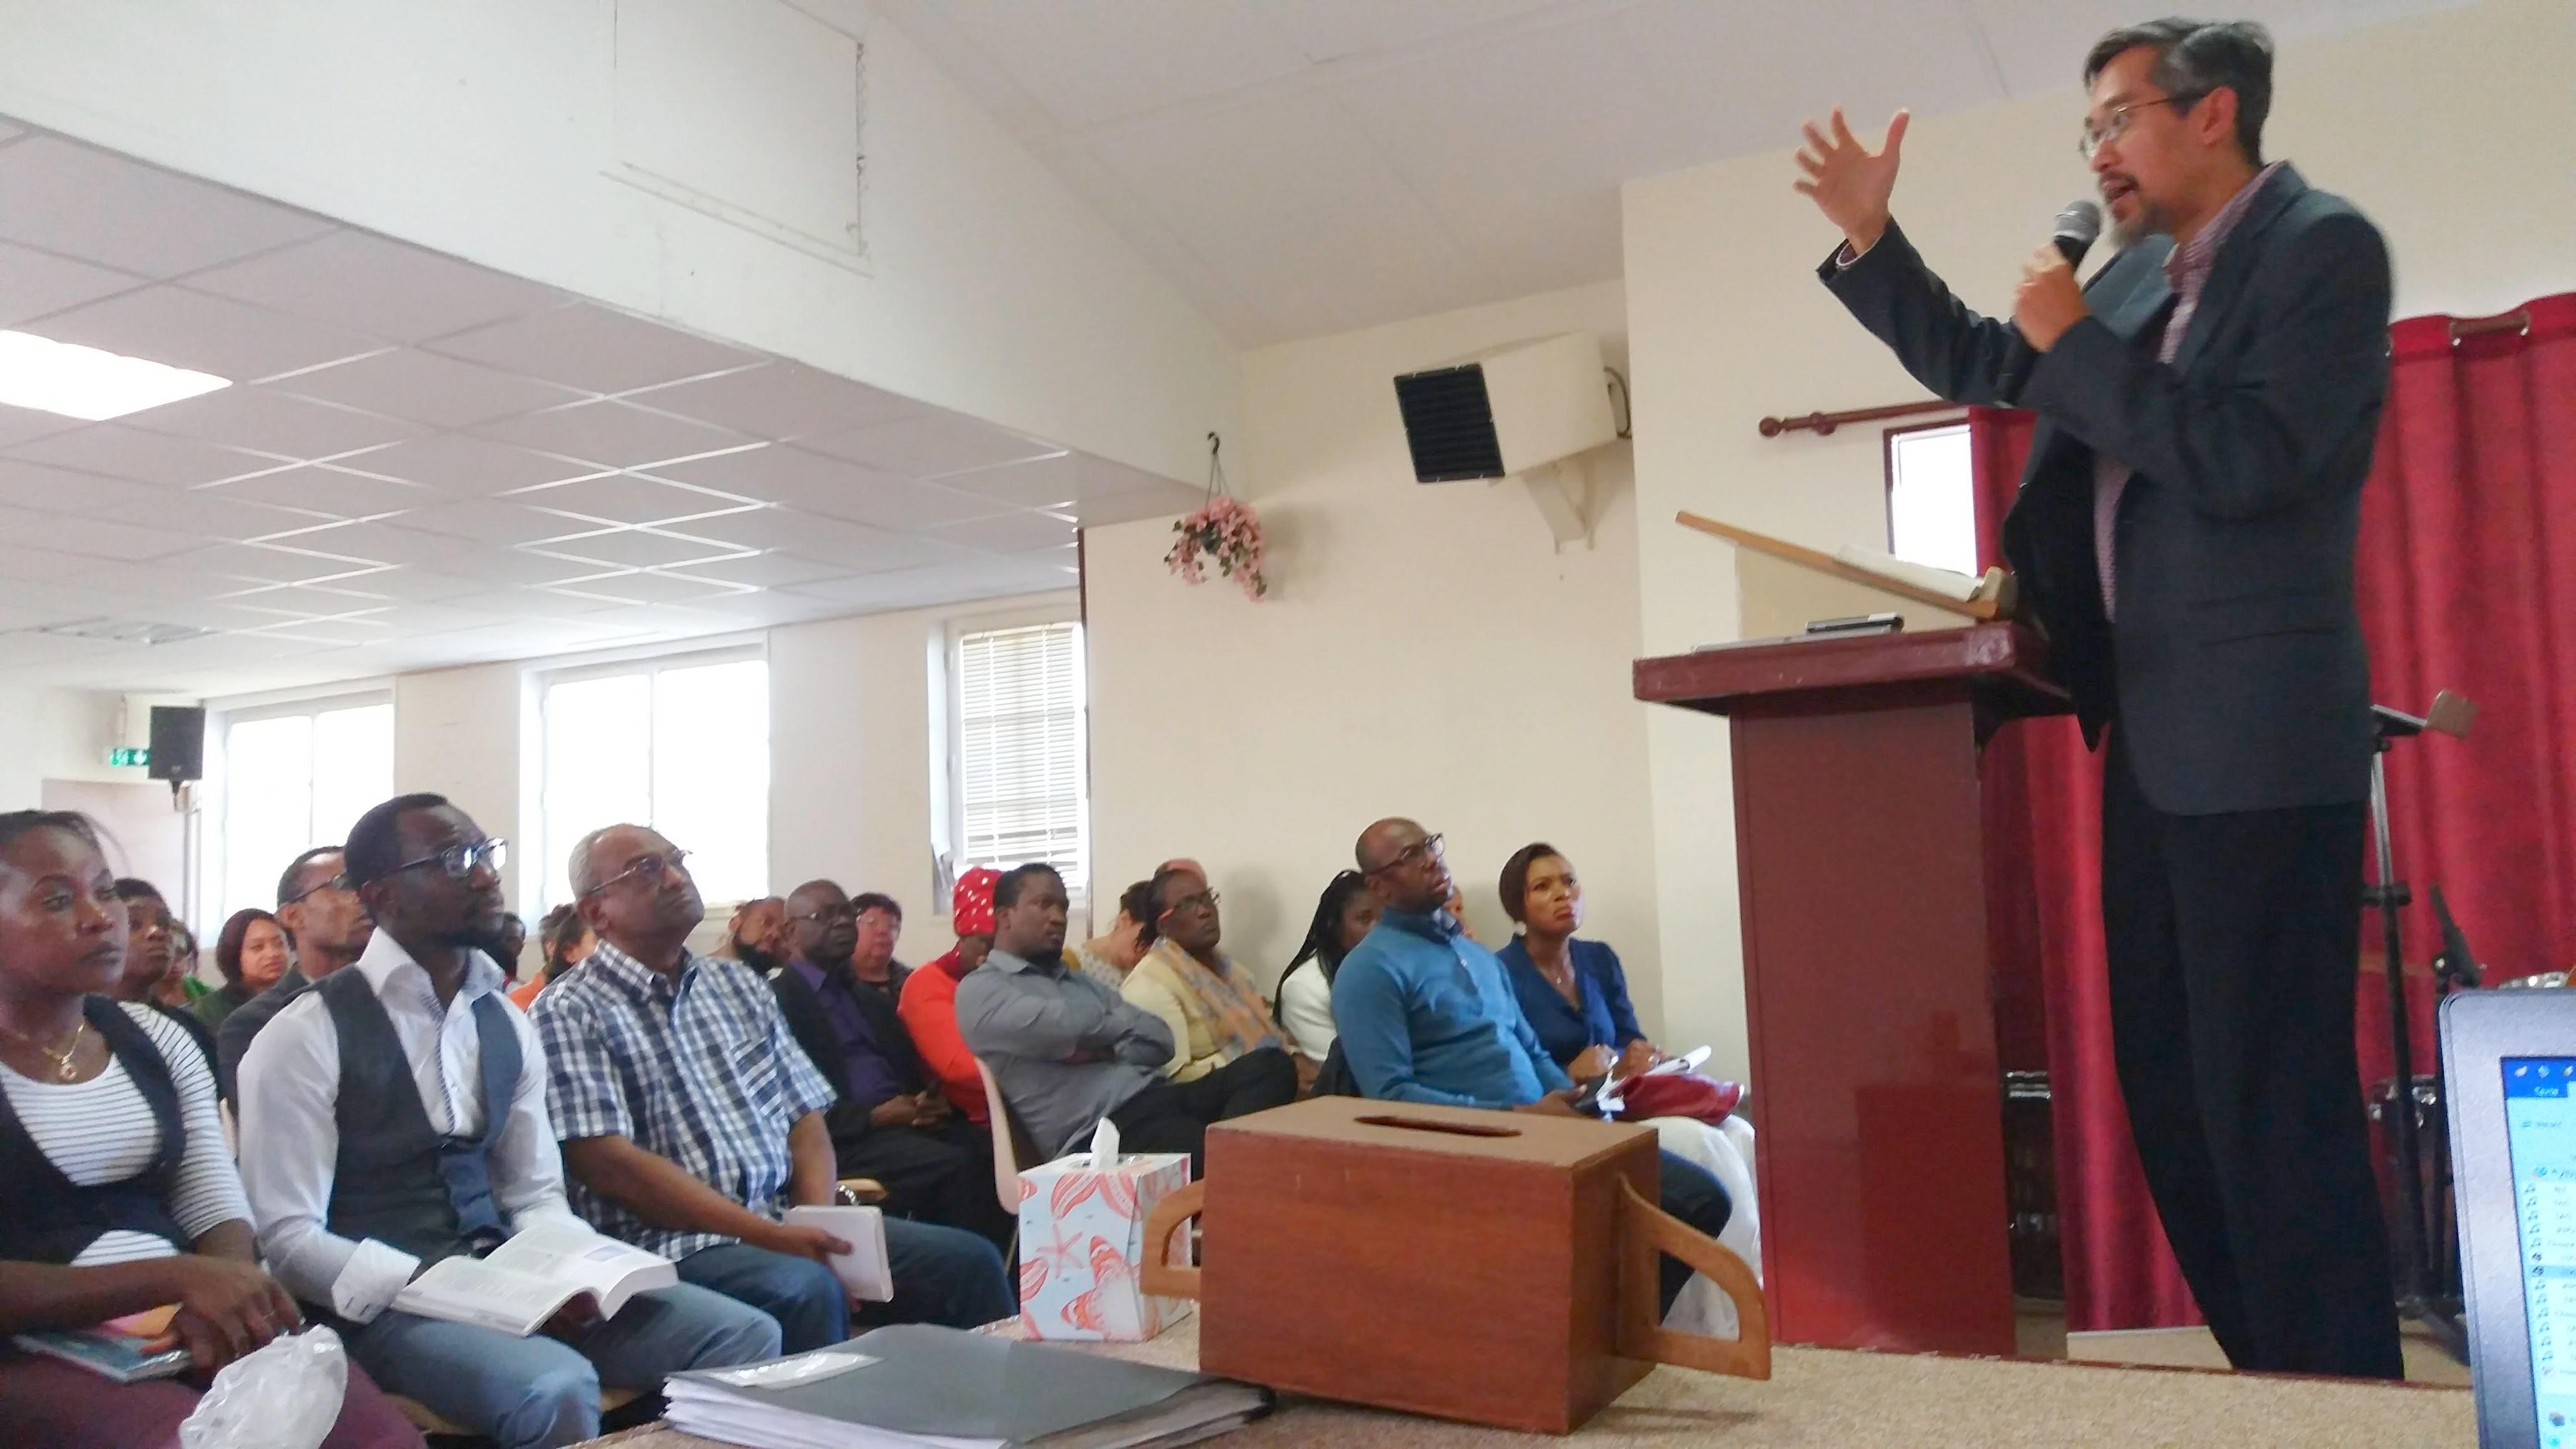 Eglise Evangélique de Gisors